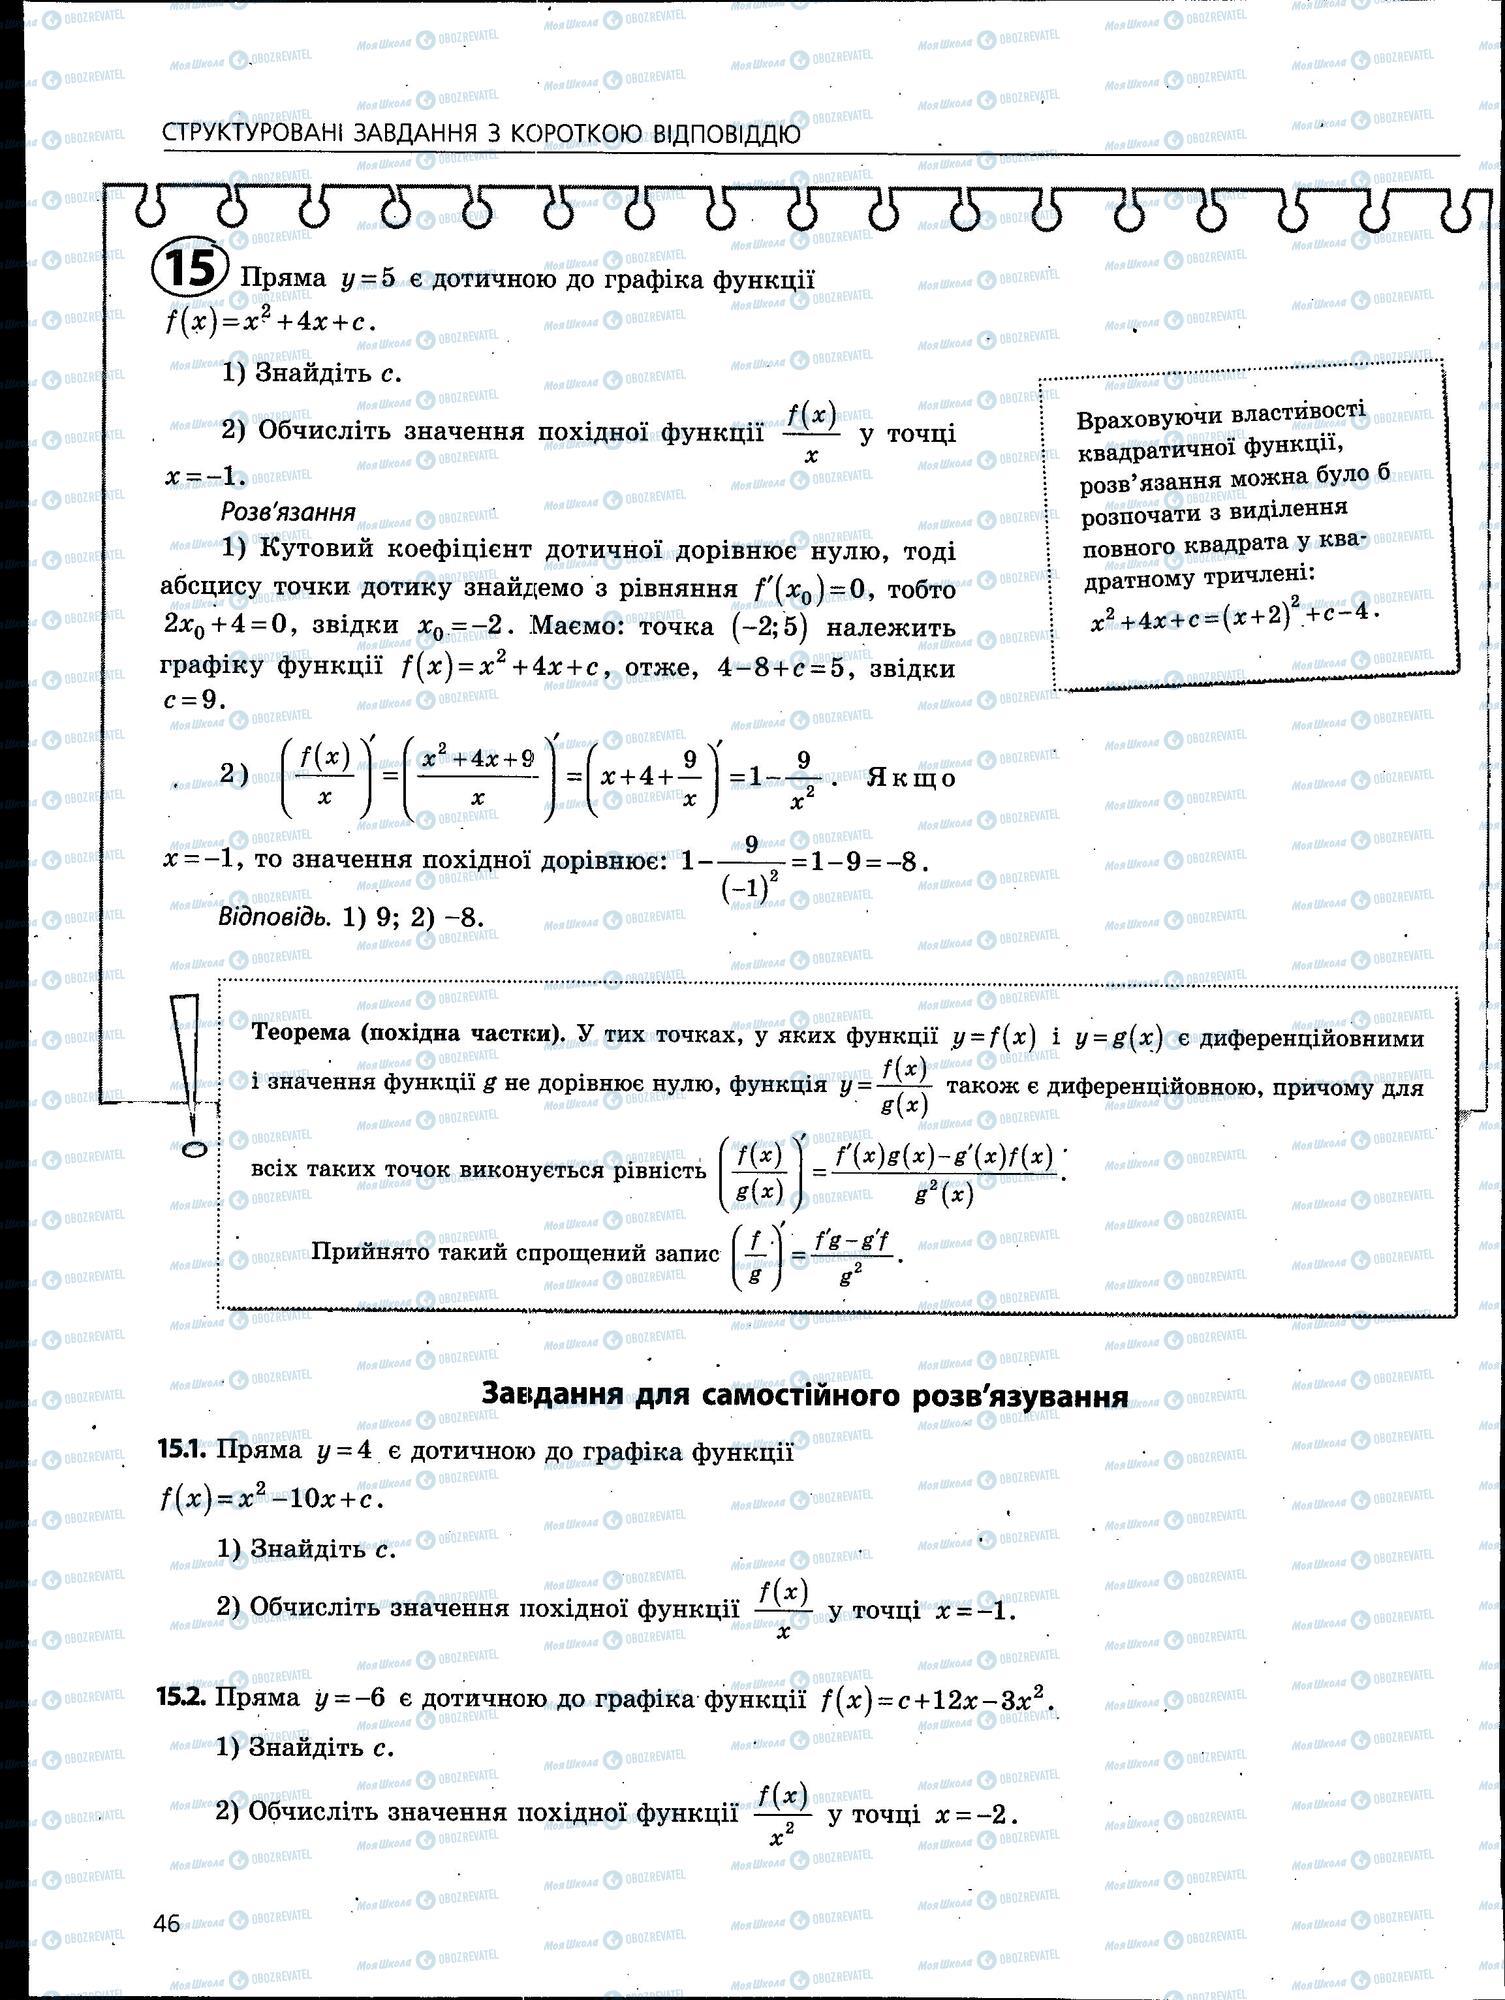 ЗНО Математика 11 класс страница 46